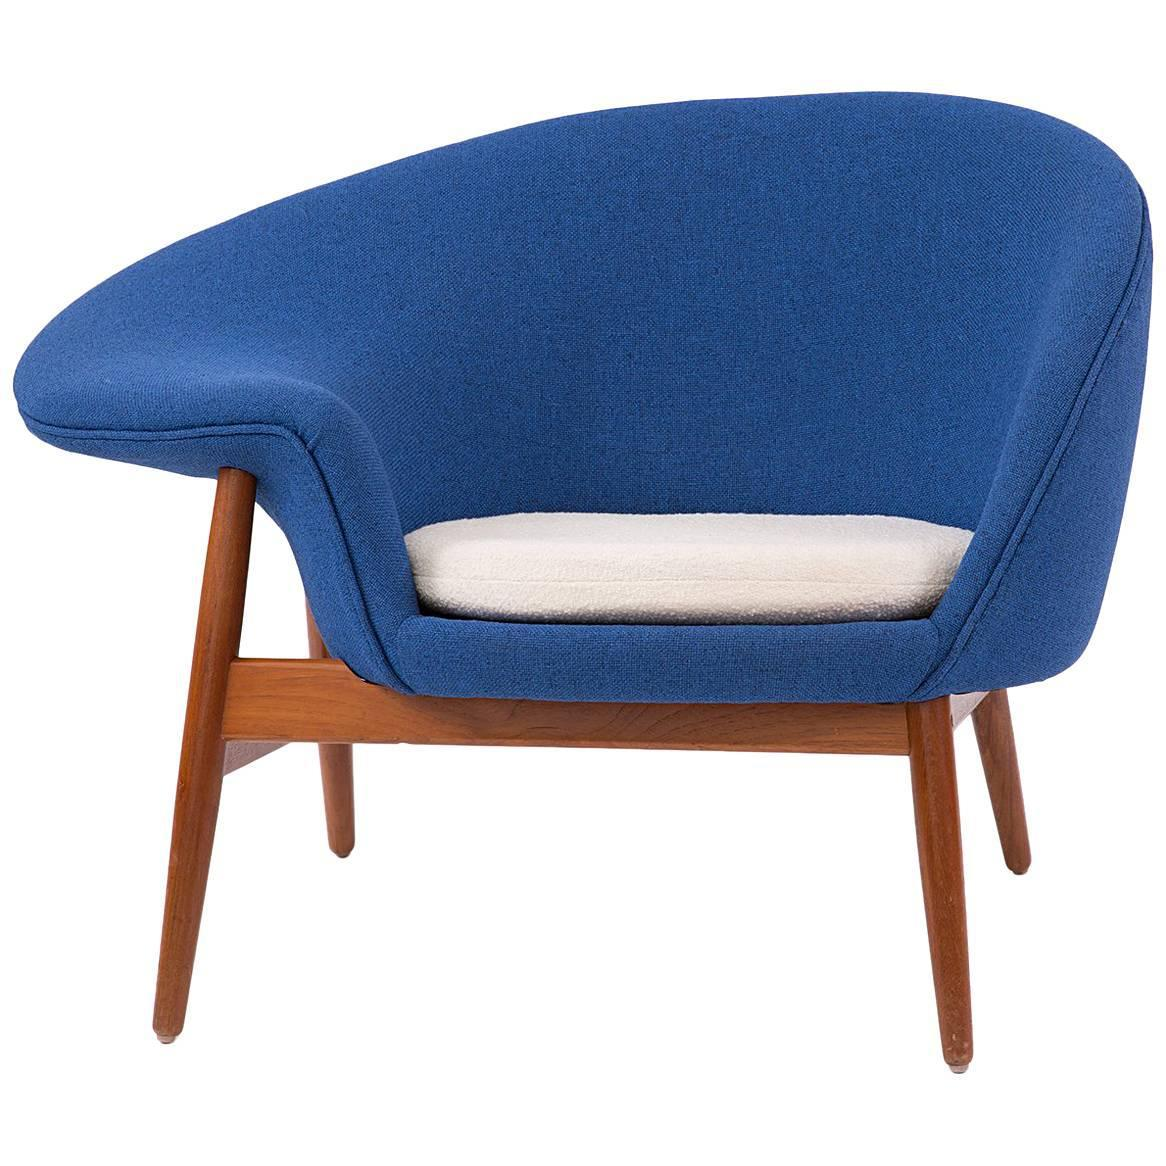 fried egg chair stool price fine 1950s hans olsen bramin blue decaso sculpting for sale image 7 of